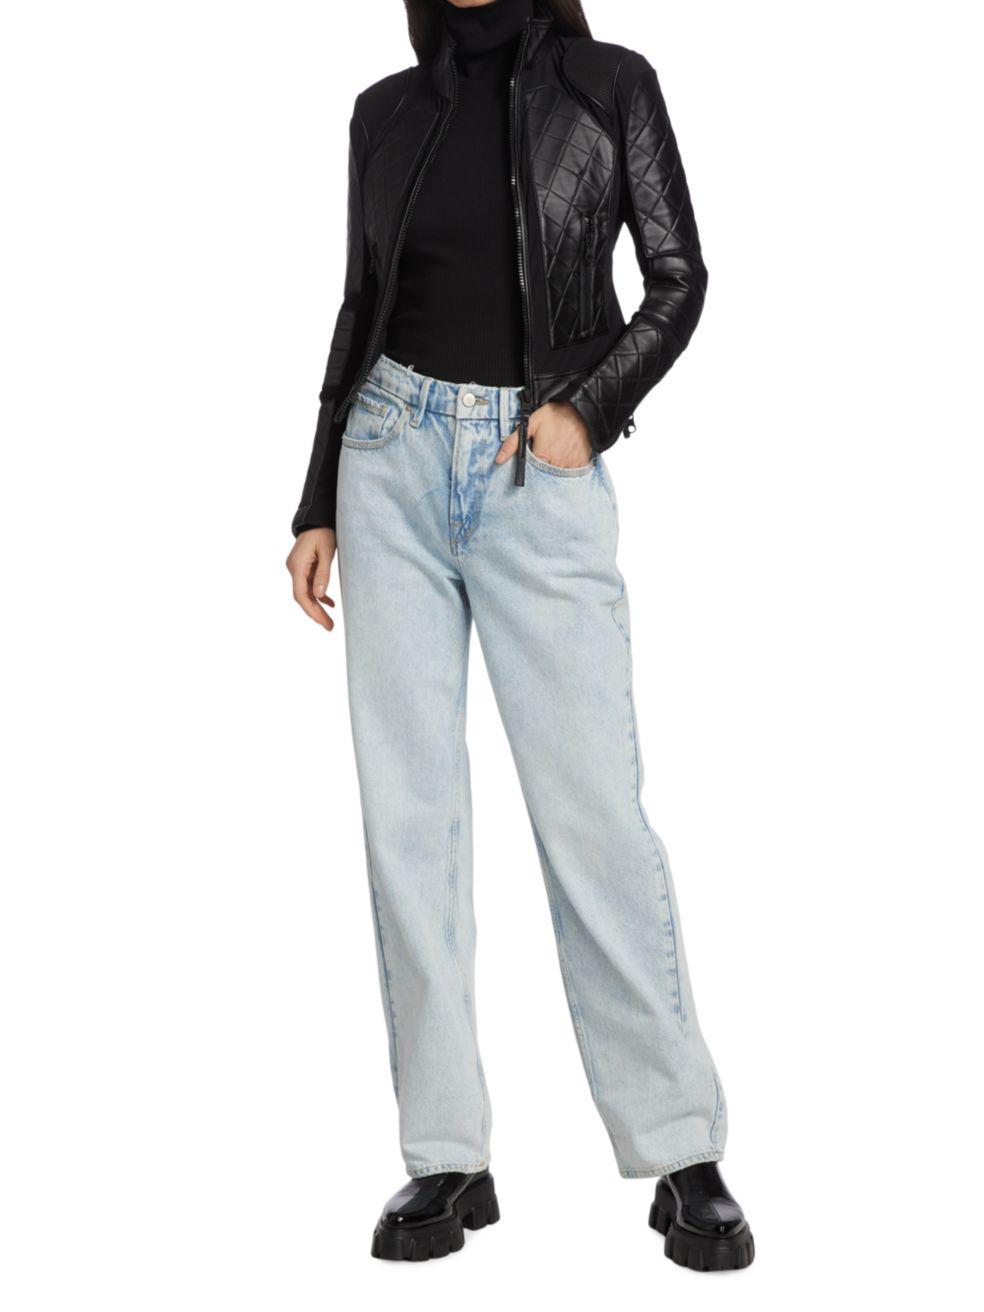 Blanc Noir Leather Moto Jacket | SaksFifthAvenue